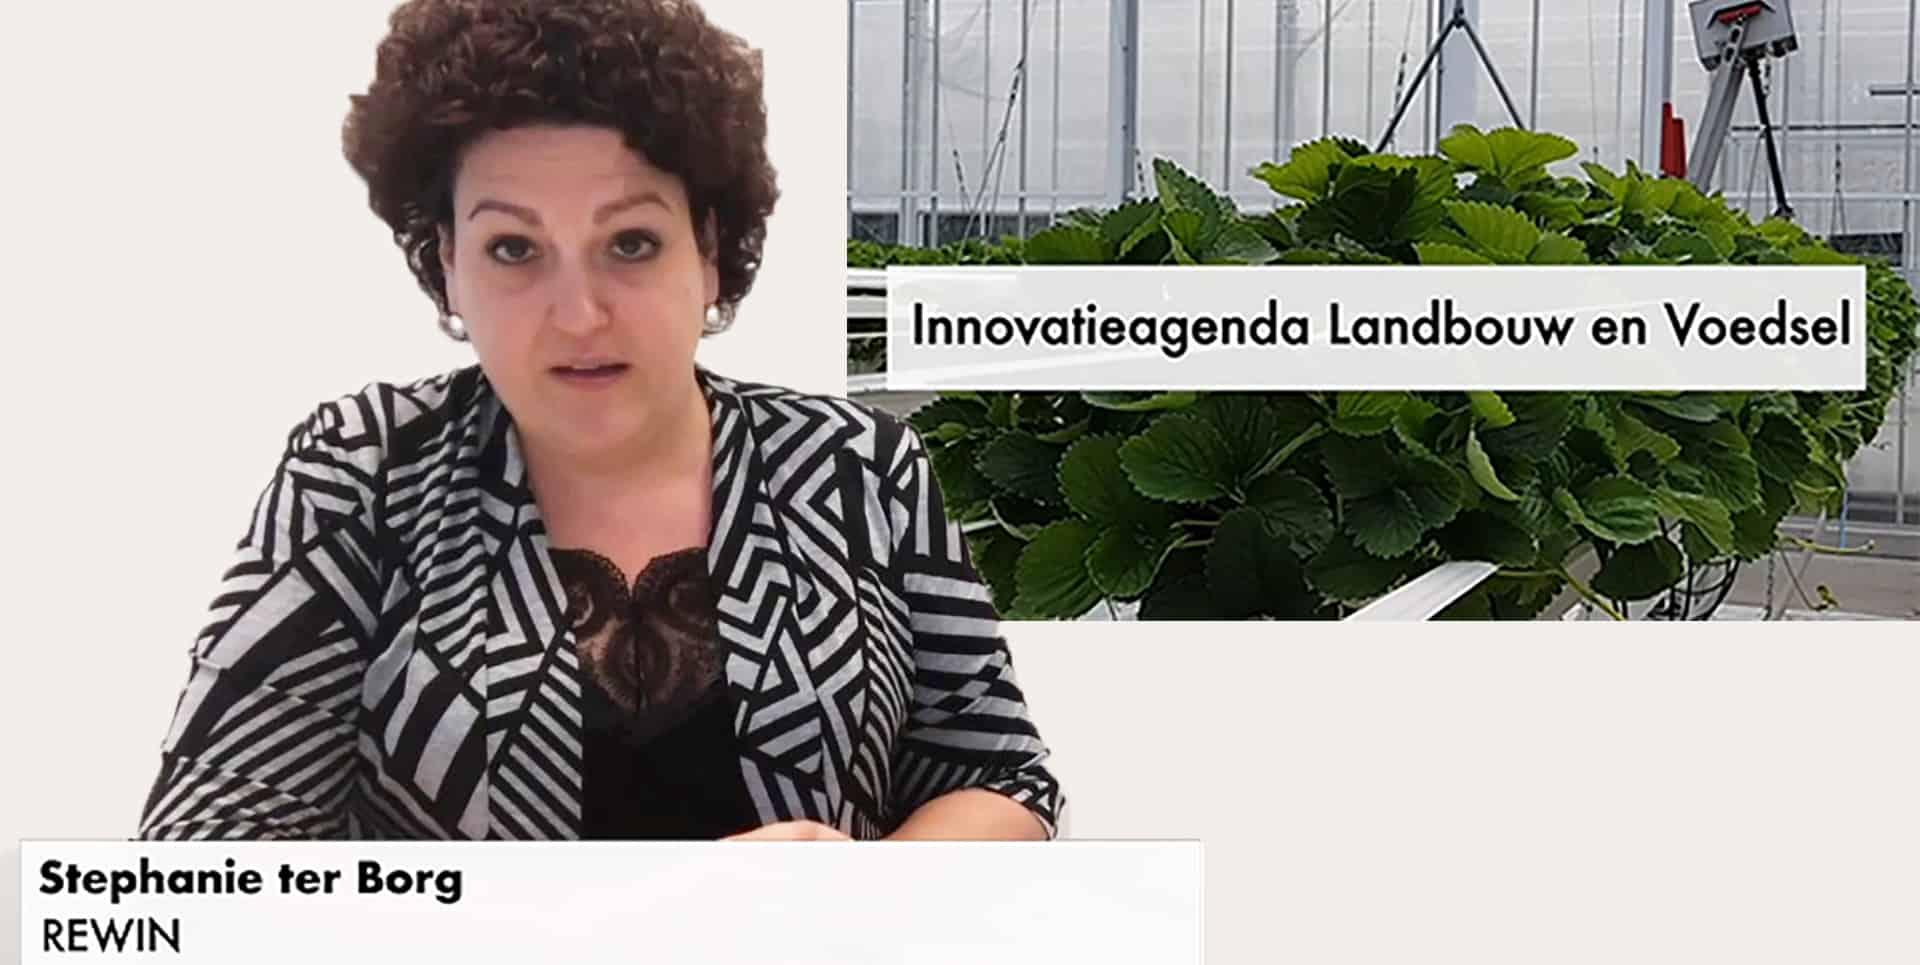 A/B Innovatieagenda